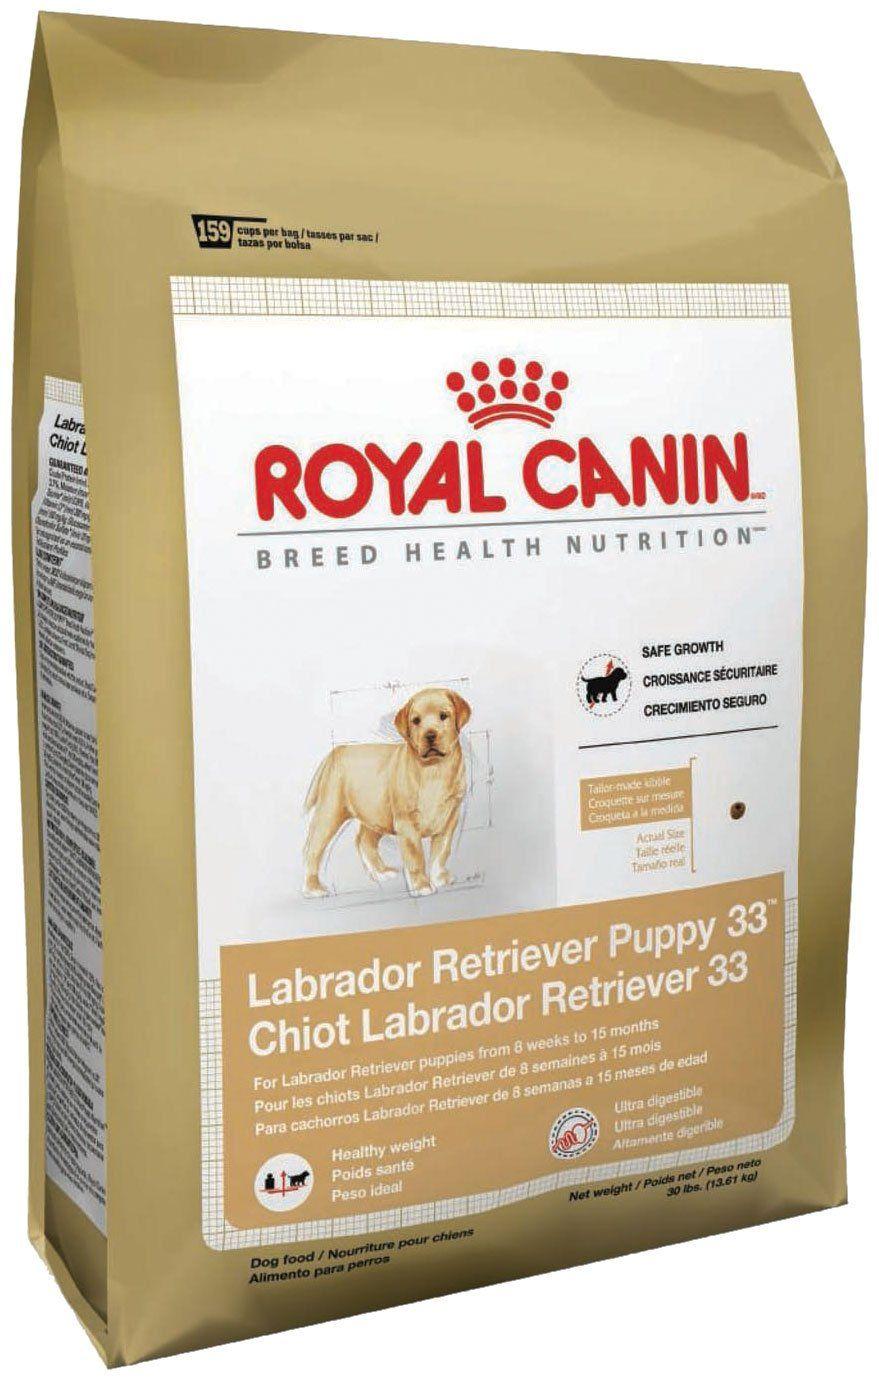 Royal Canin Breed Health Nutrition Labrador Retriever Puppy Dry